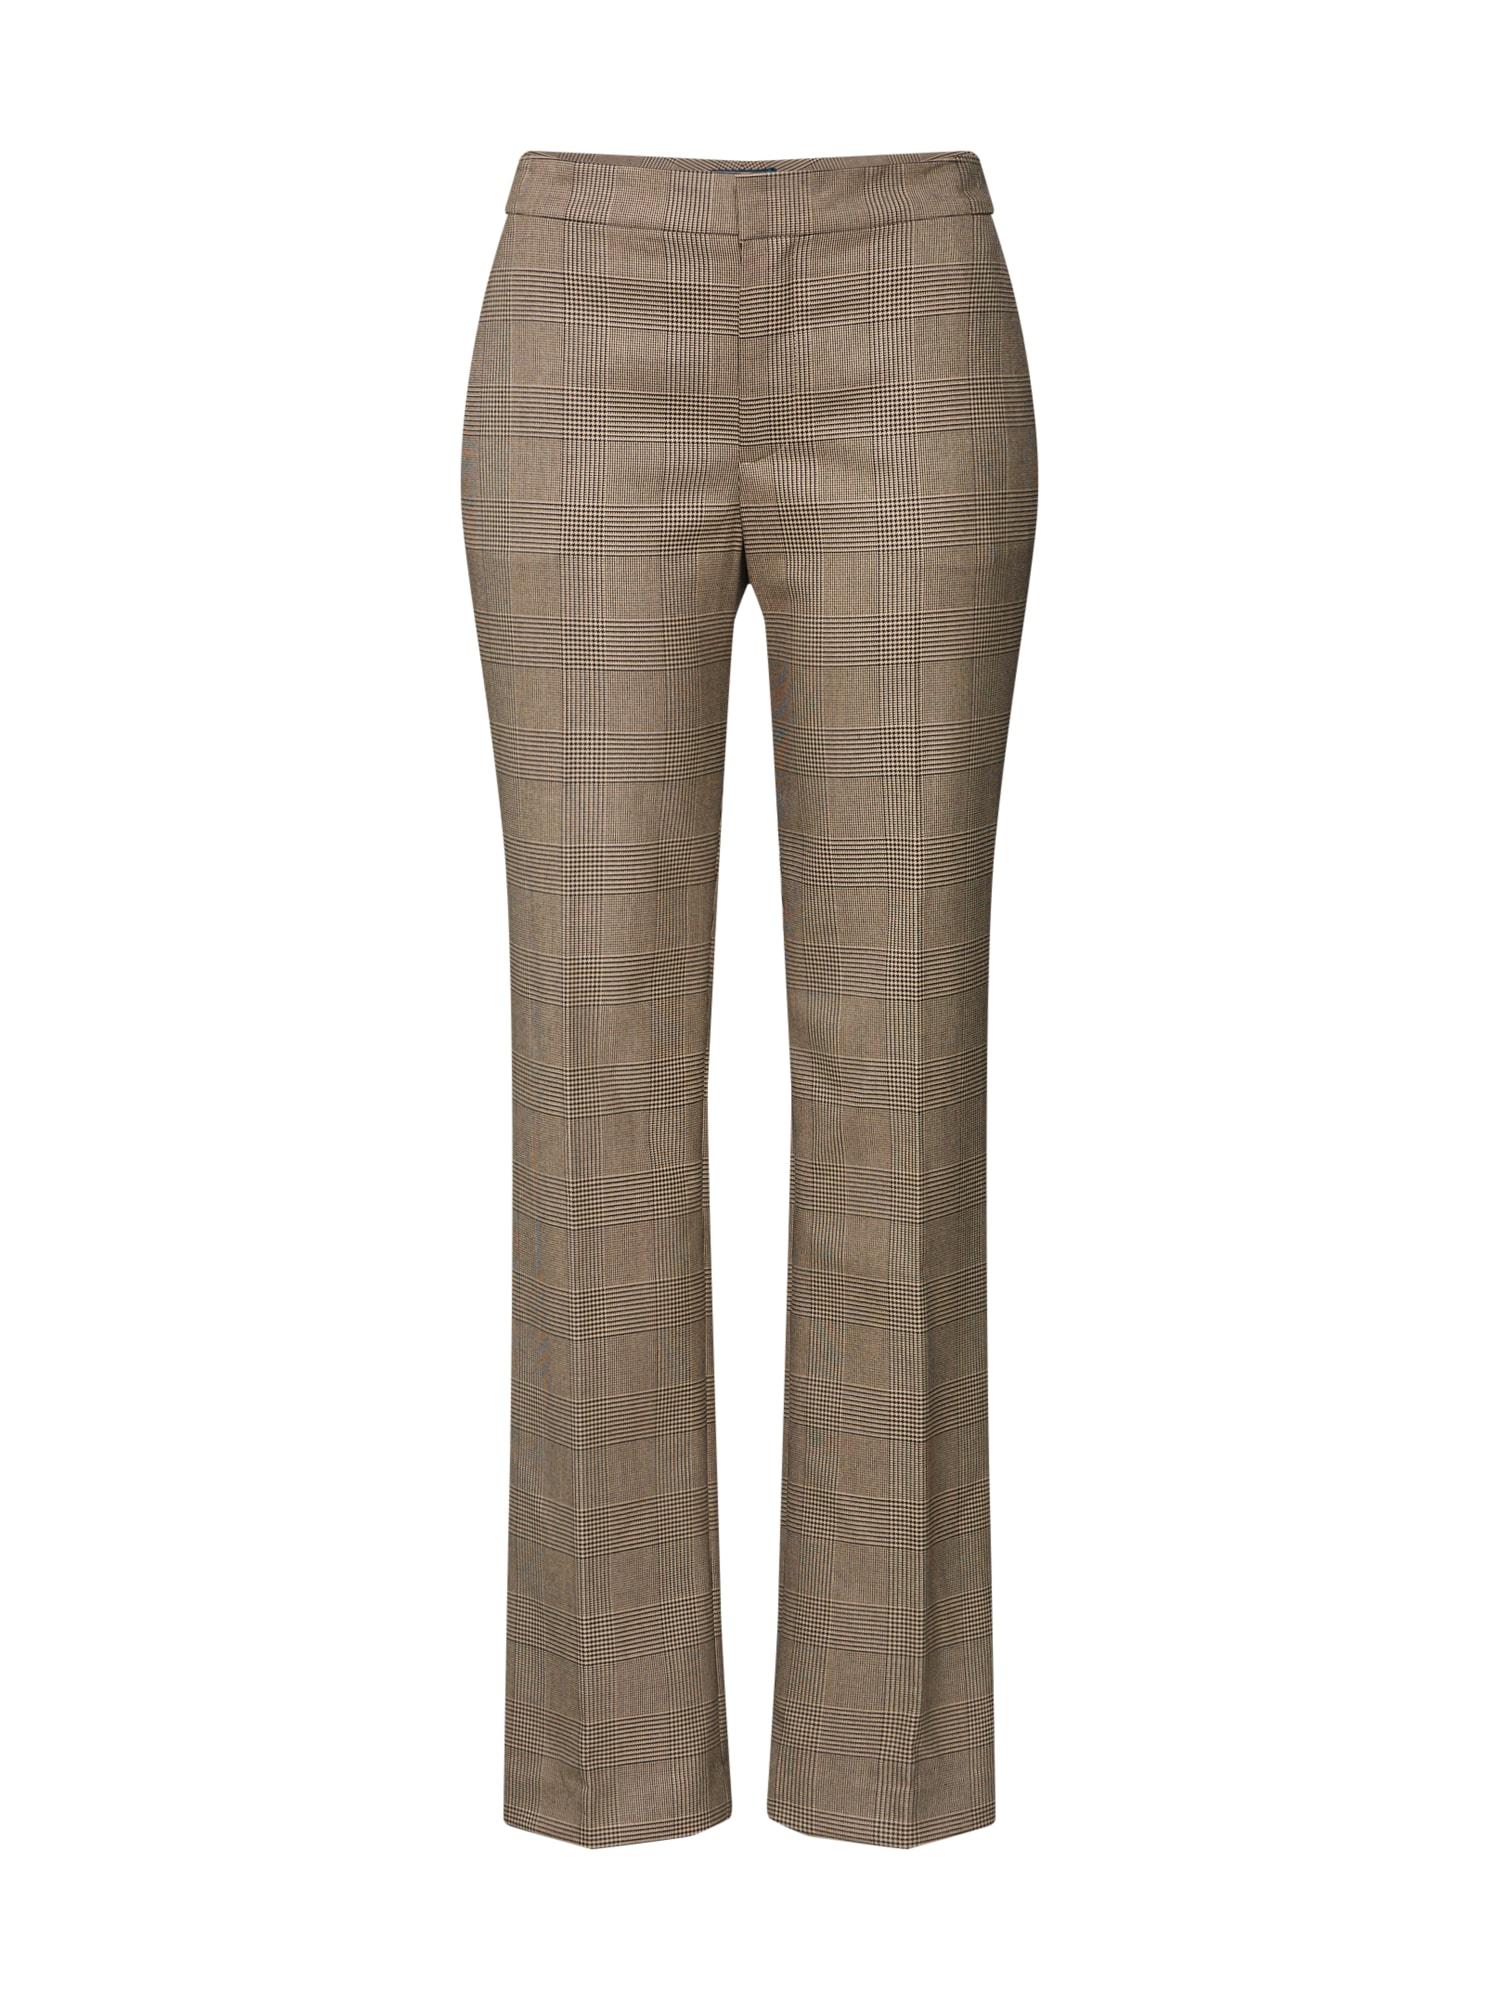 Kalhoty s puky velbloudí světle hnědá Lauren Ralph Lauren